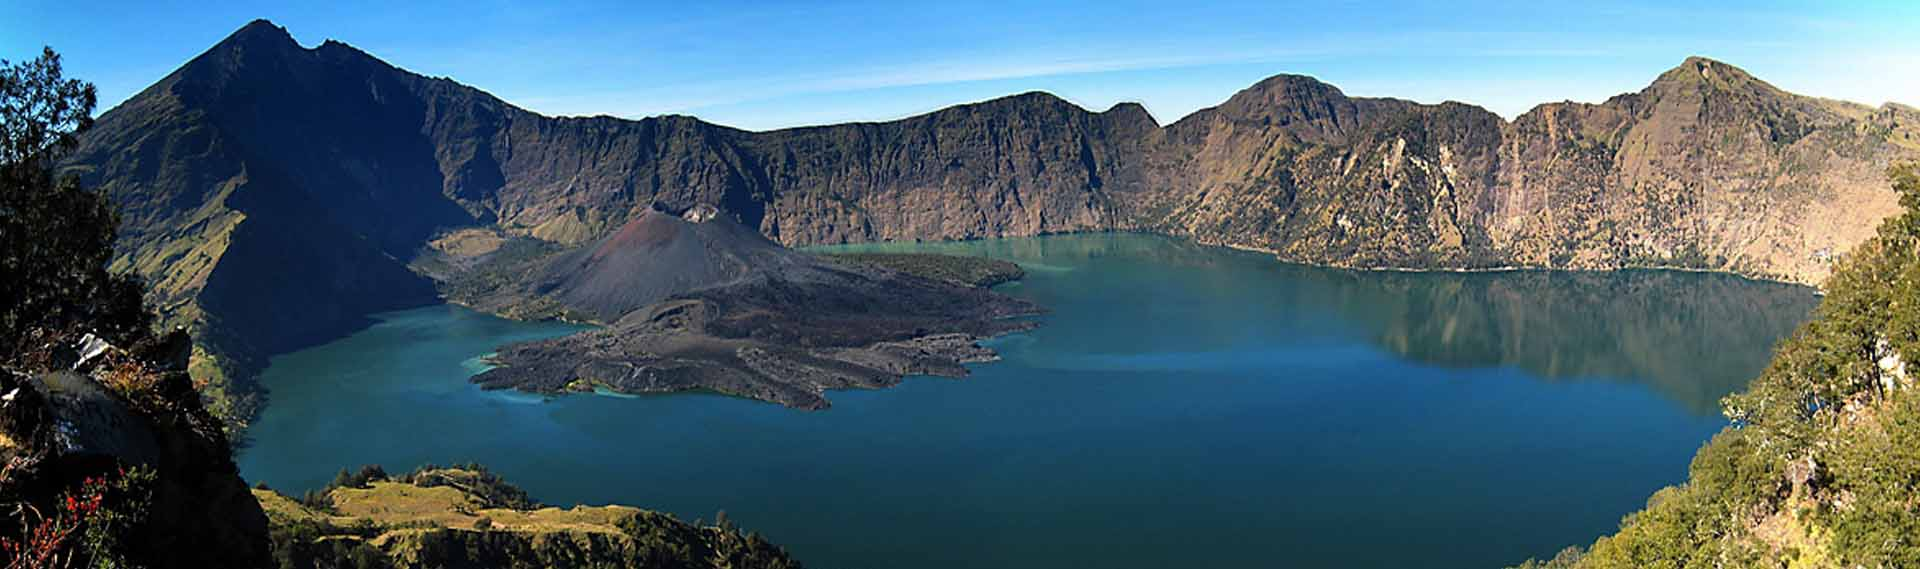 Climbing mount rinjani package lombok island indonesia about us - Climbing Mount Rinjani Package Lombok Island Indonesia About Us 11